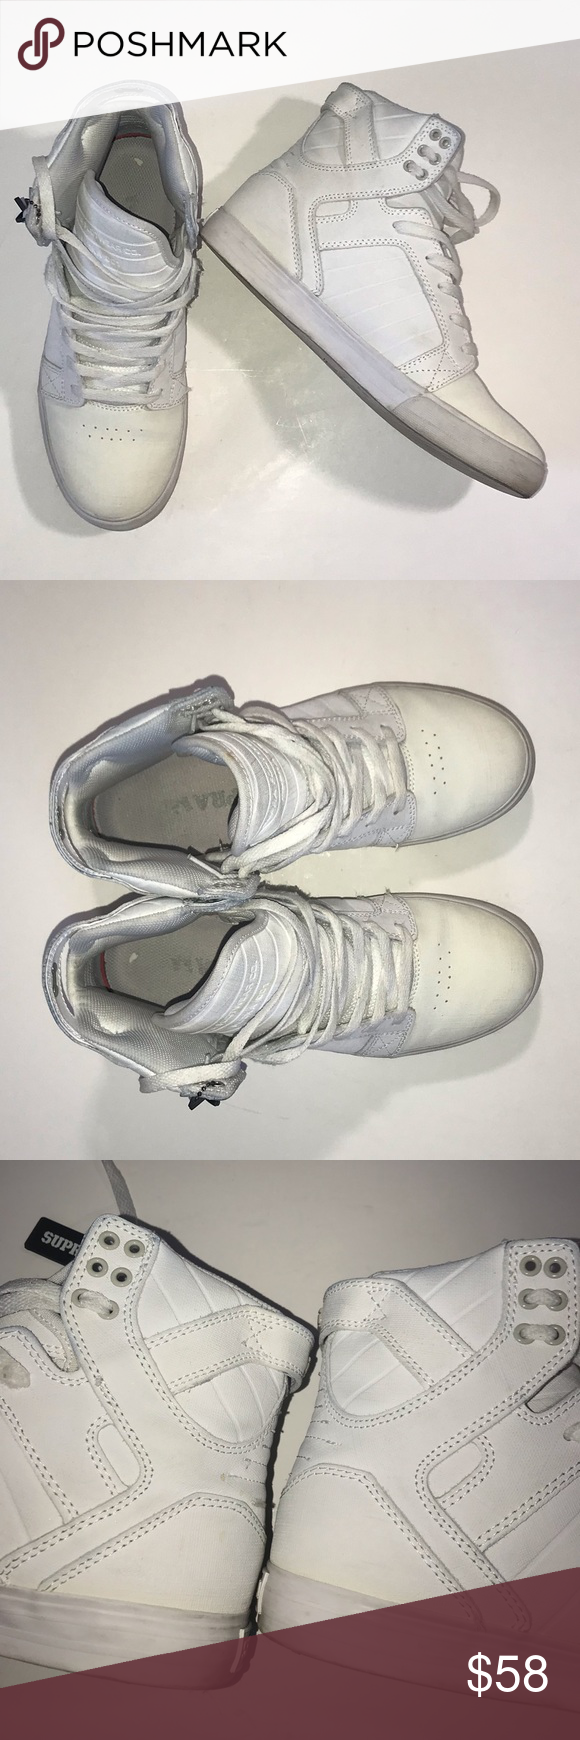 Supra Muska 001 White Sneakers Size 8.5